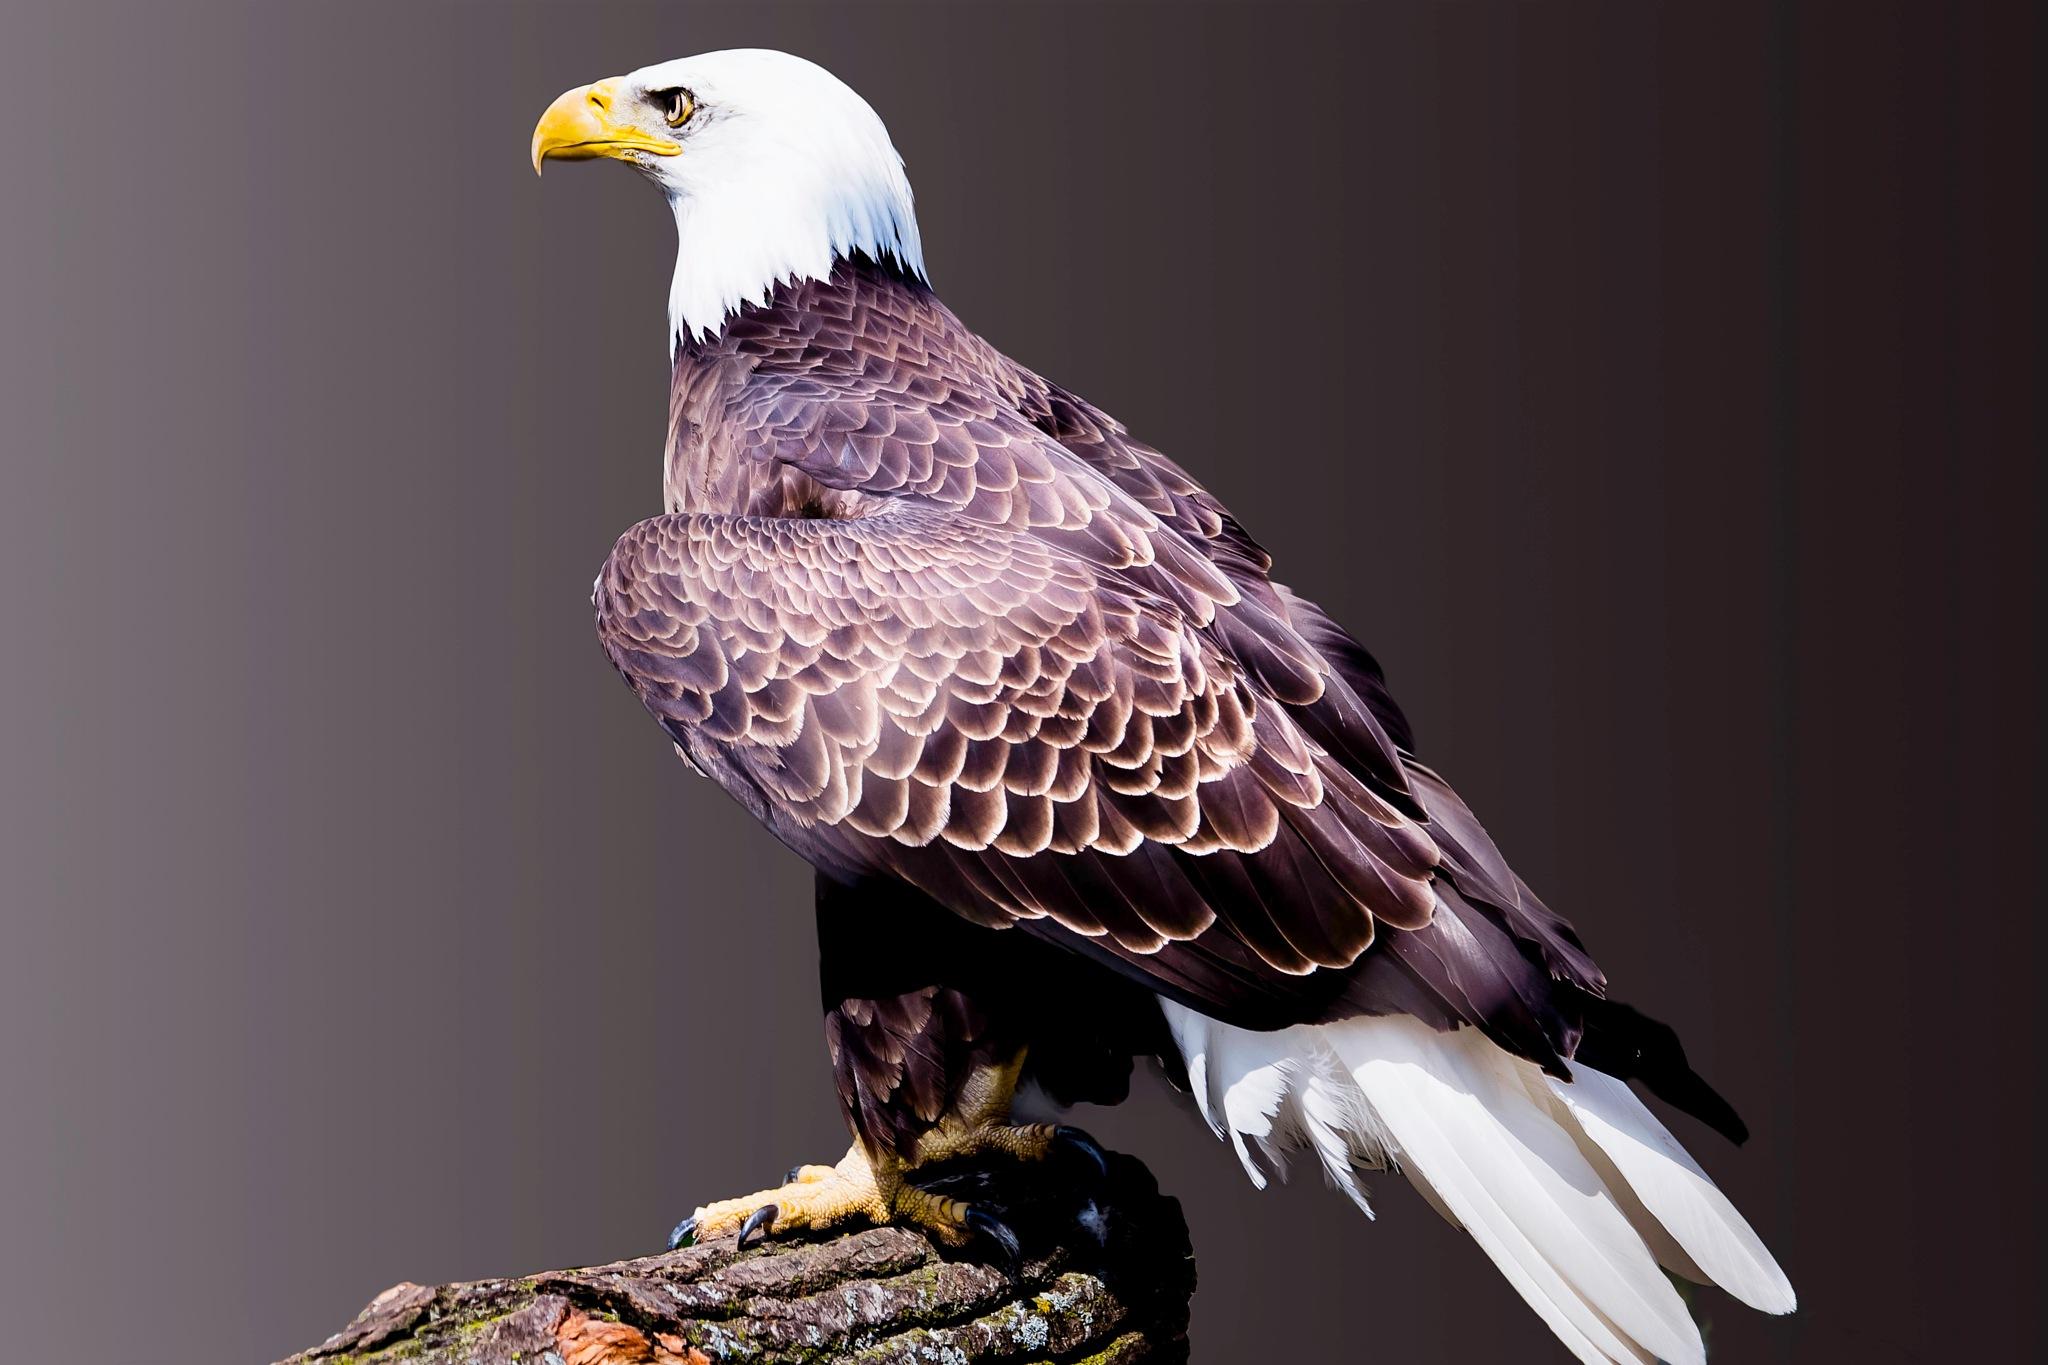 Eagle Guardian by AmanPhotos